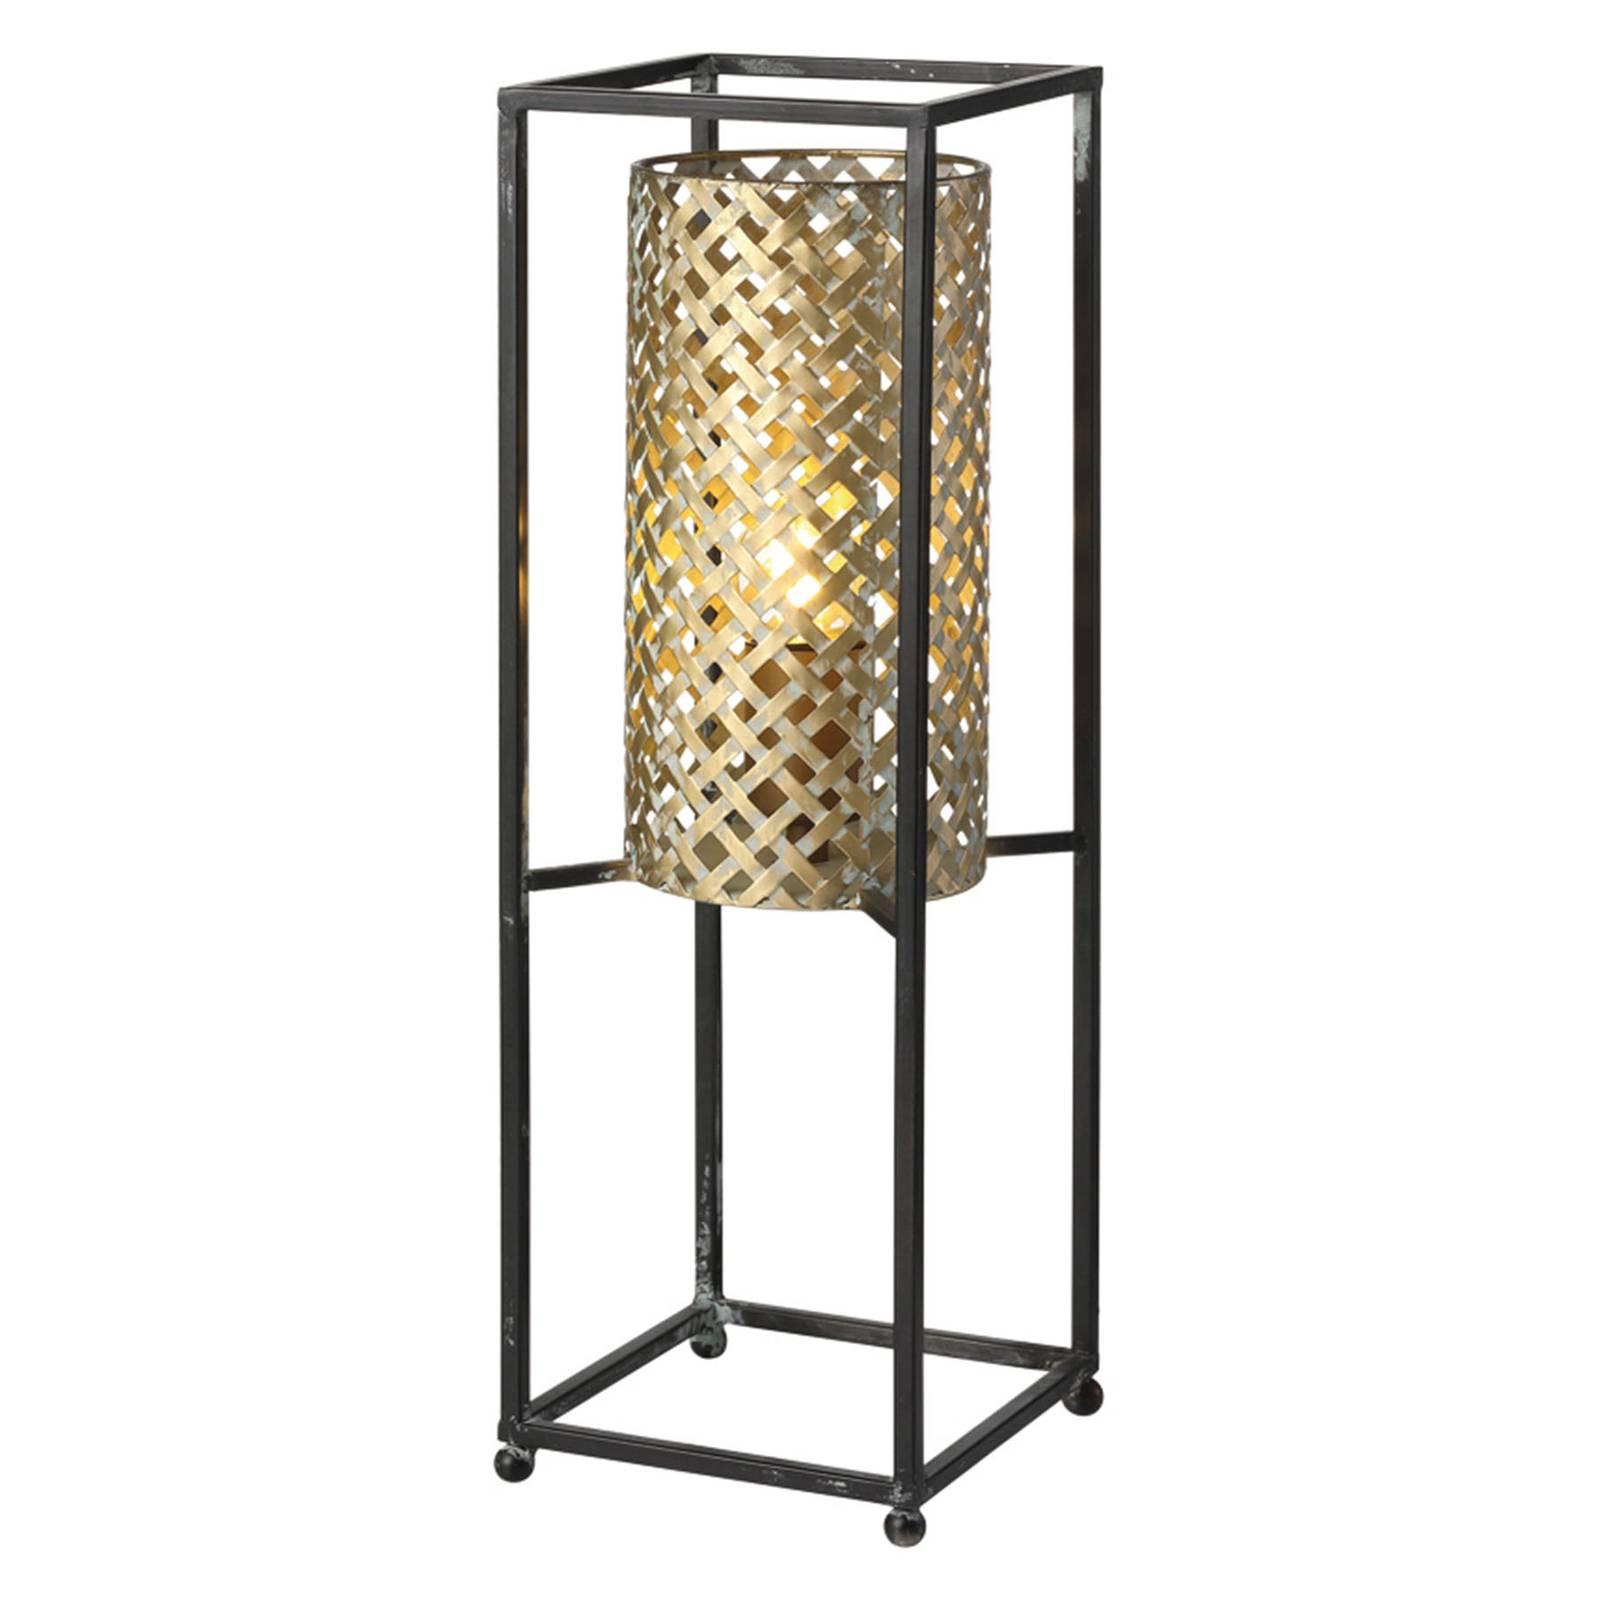 Tafellamp Petrolio, zwart / goud, hoogte 47 cm